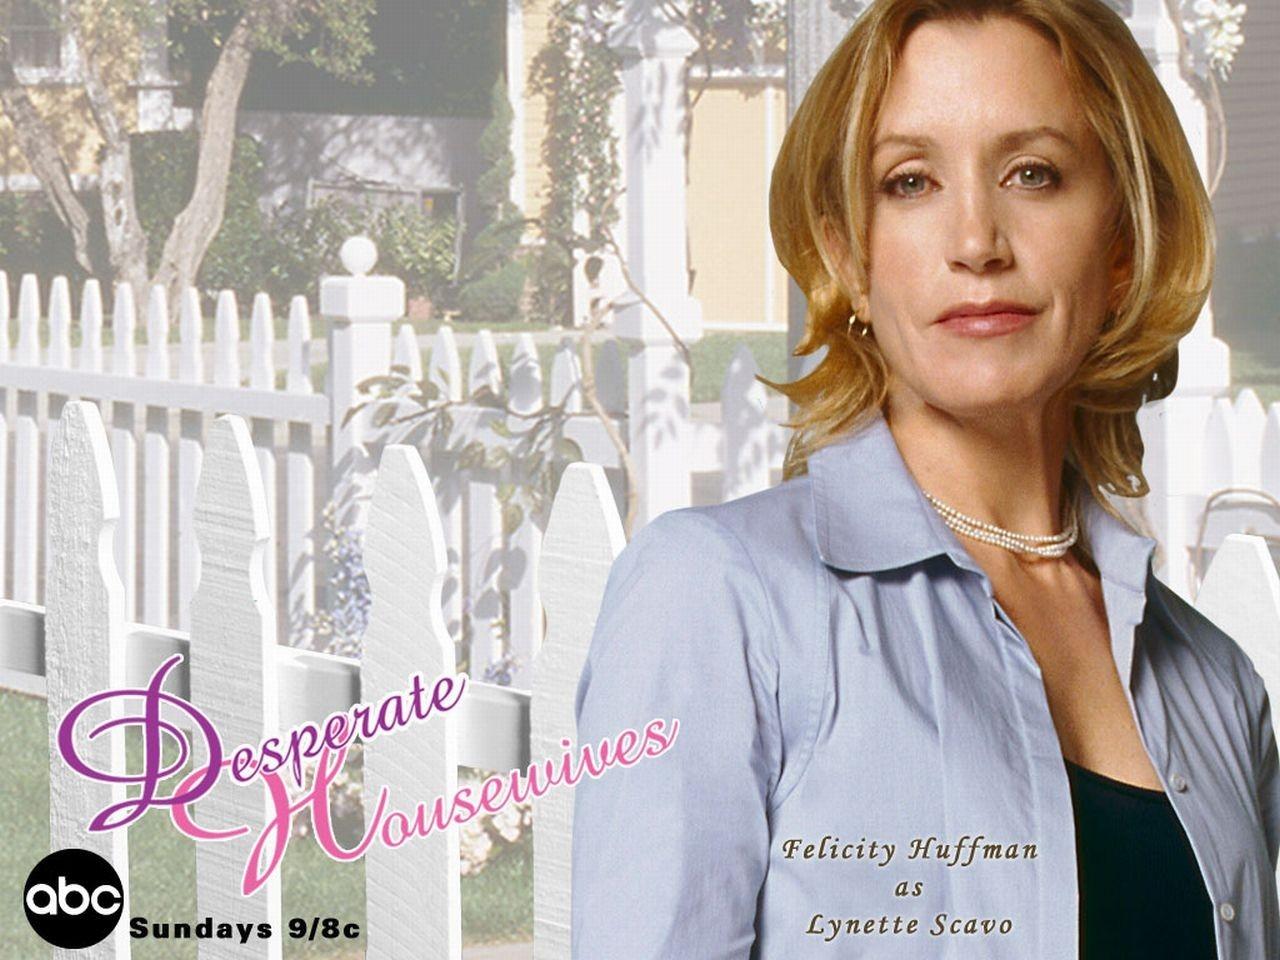 Wallpaper della serie Desperate Housewives con Lynette Scavo (Felicity Huffman)